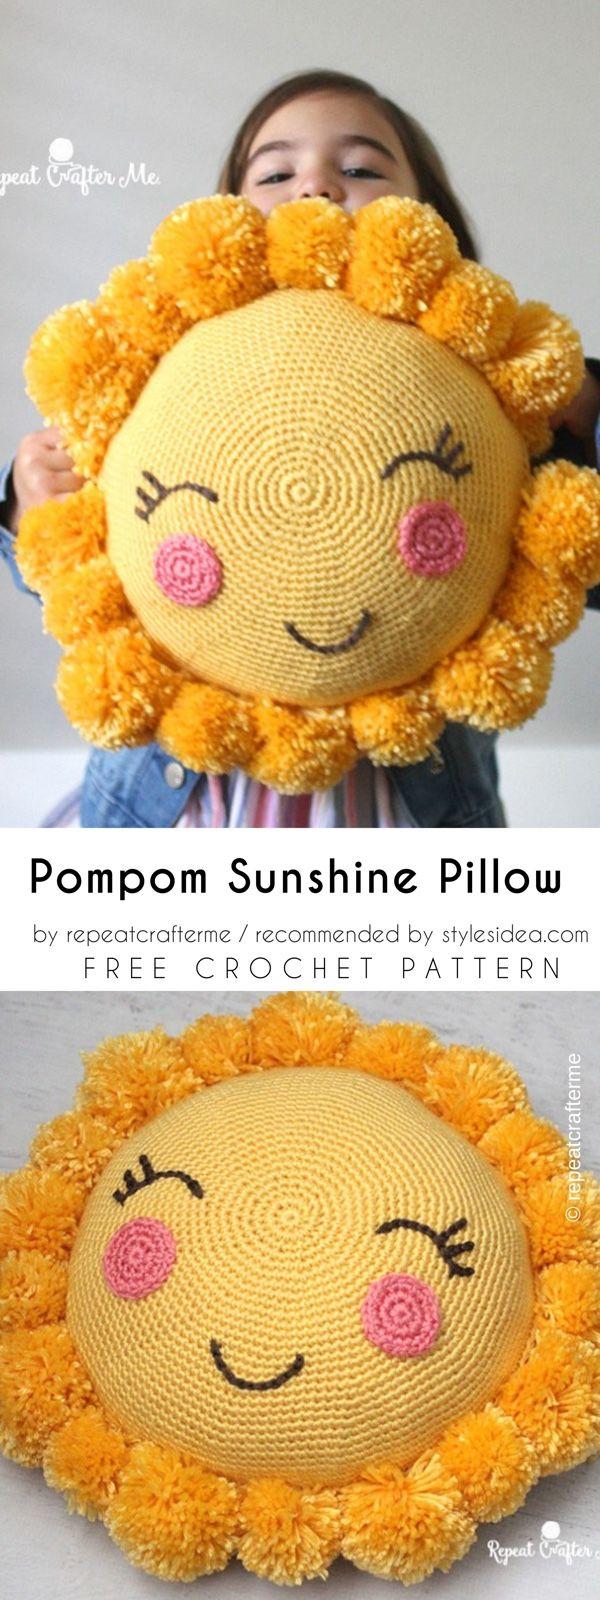 Pompom Sunshine Pillow Free Crochet Pattern   Babyparty, Häkeln und ...